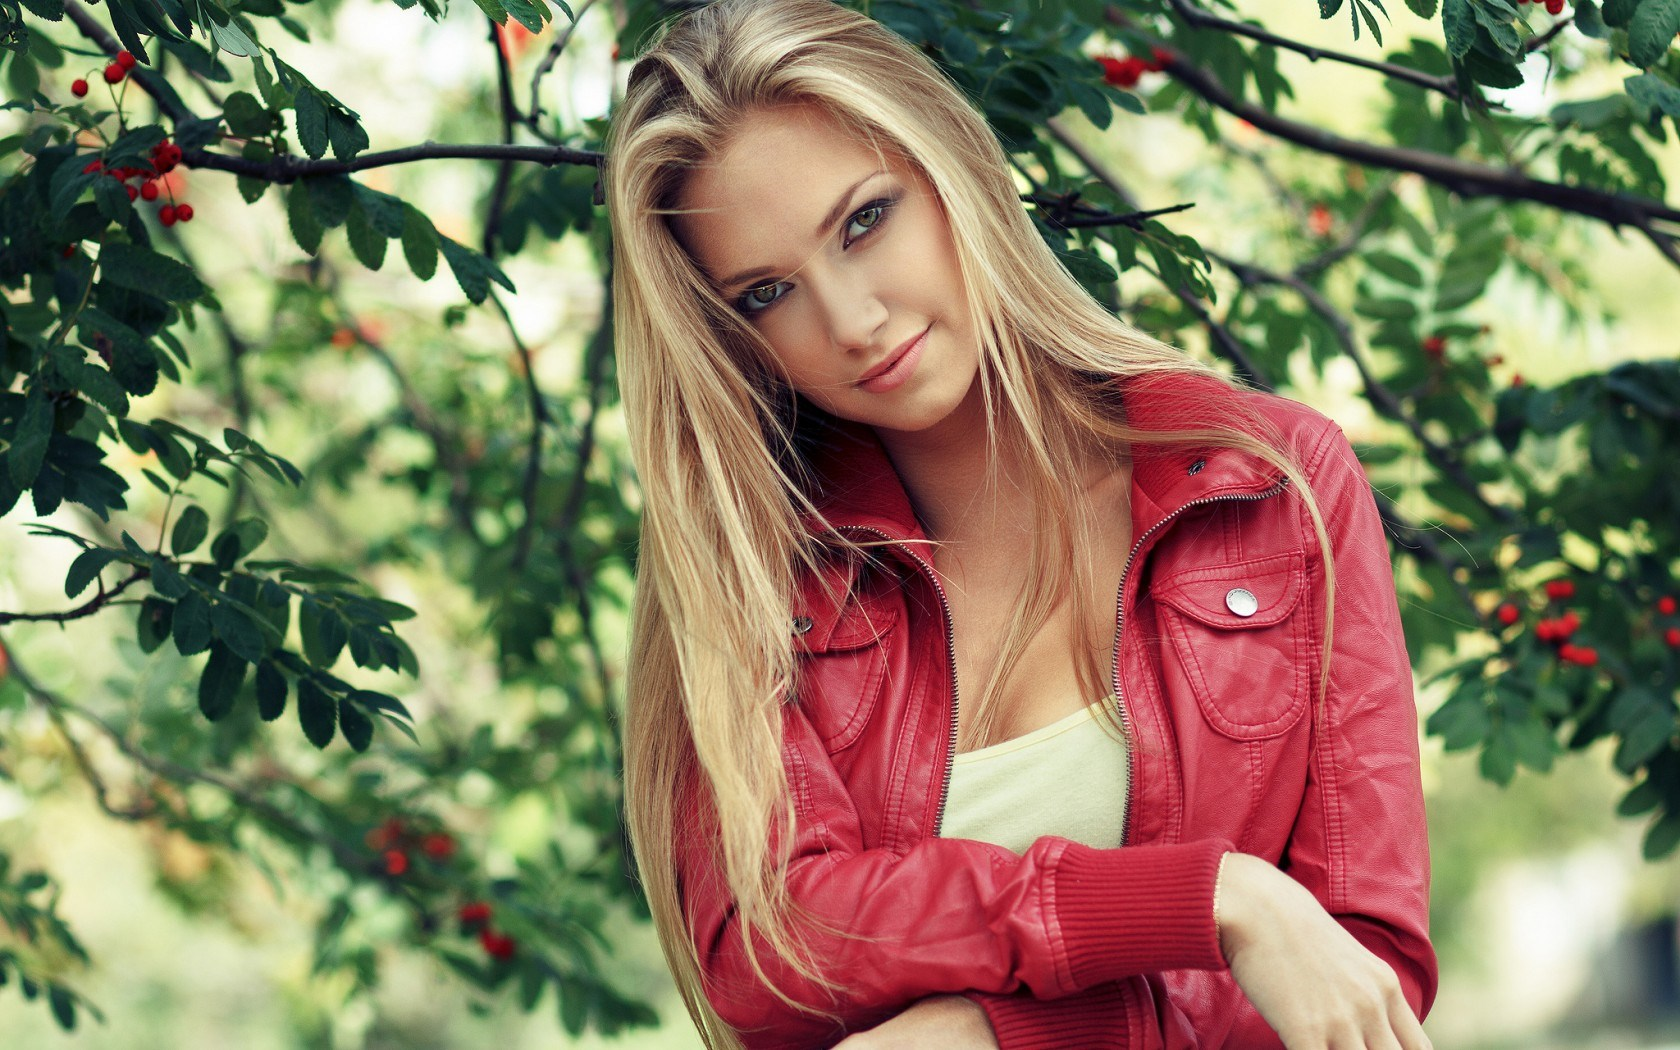 Lovely Blonde Fashion